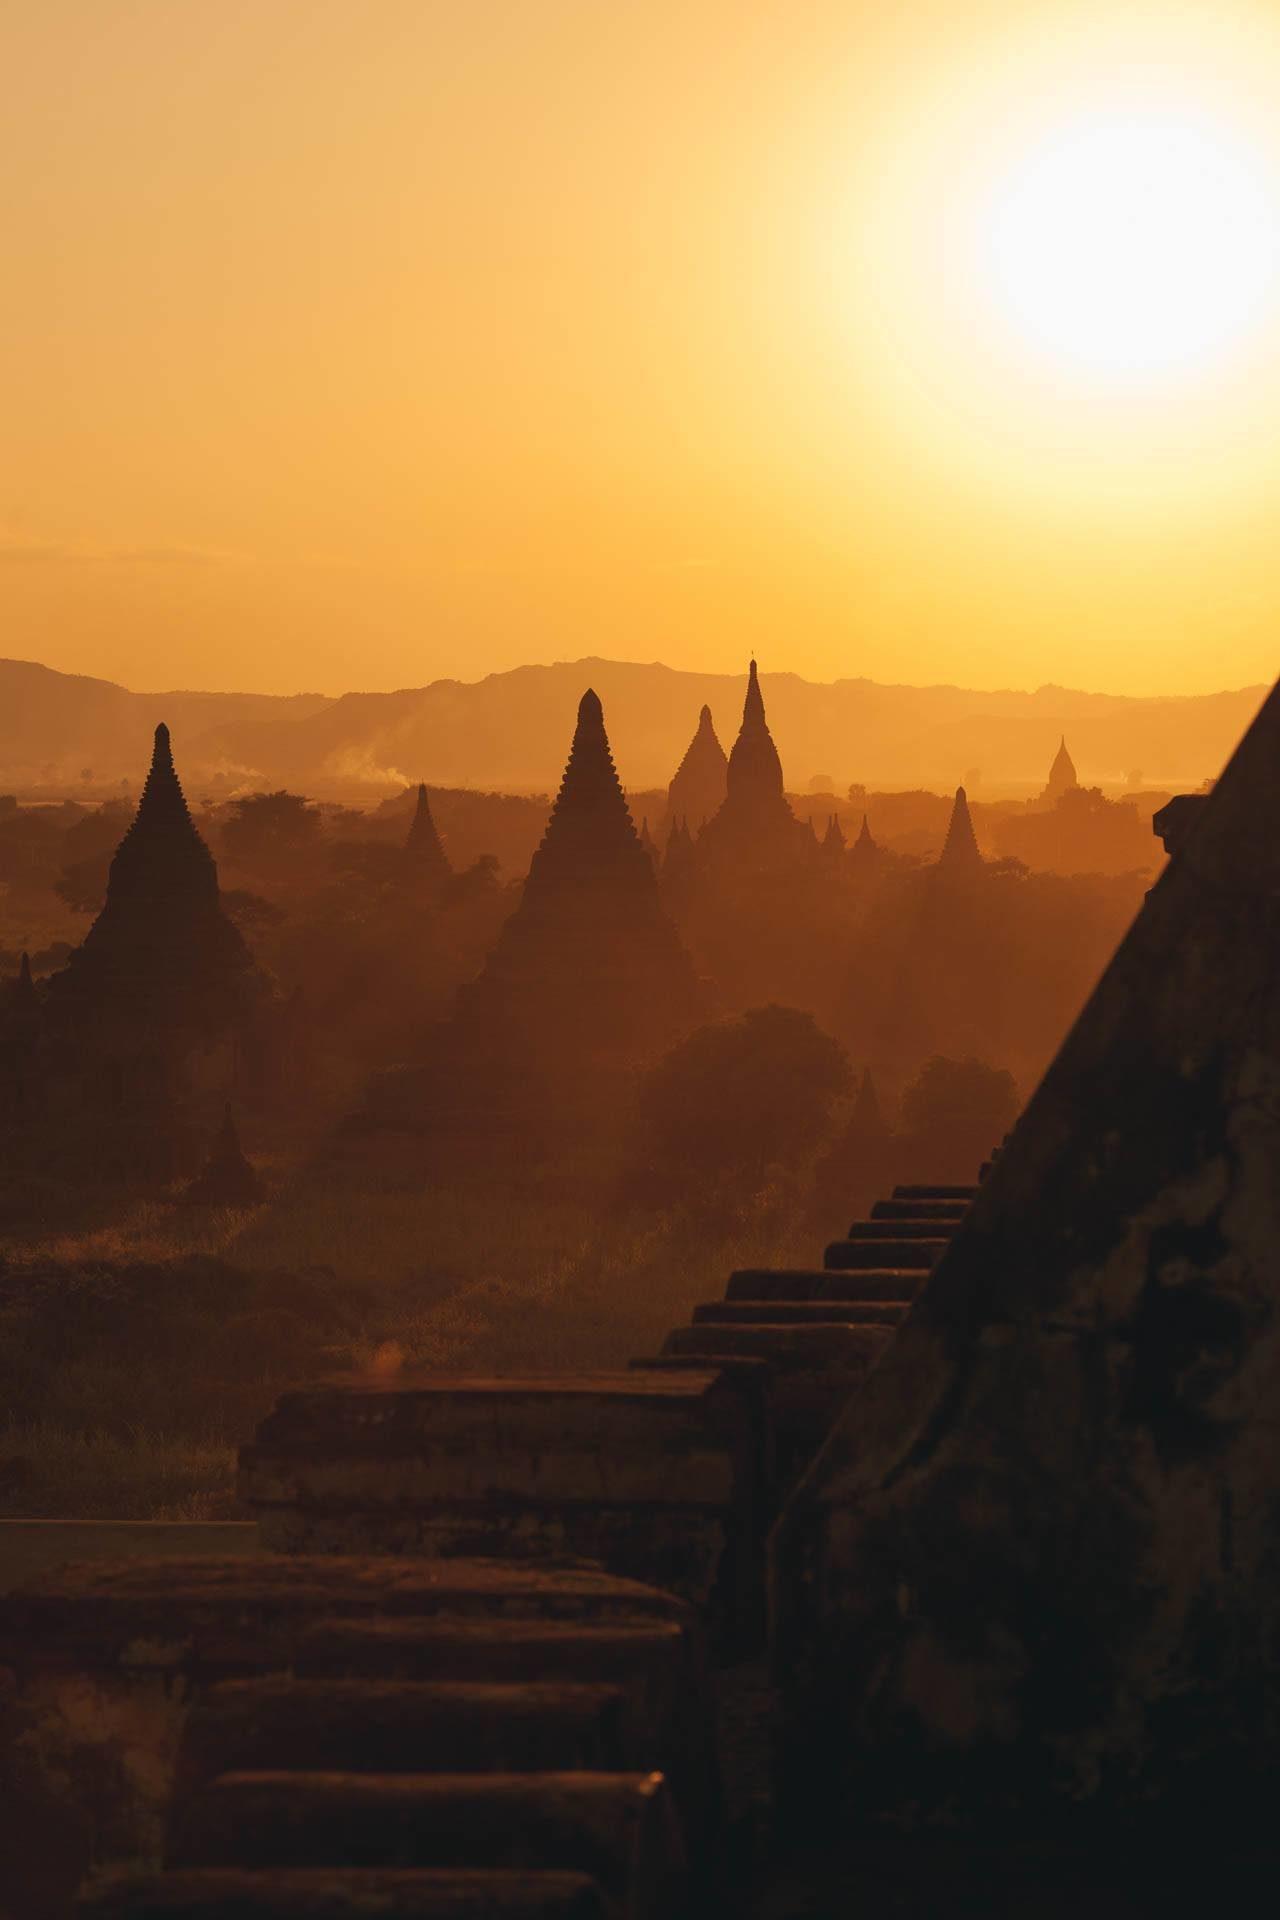 Tempelanlage Sonnenuntergang Myanmar Fotostory von Nils Junker